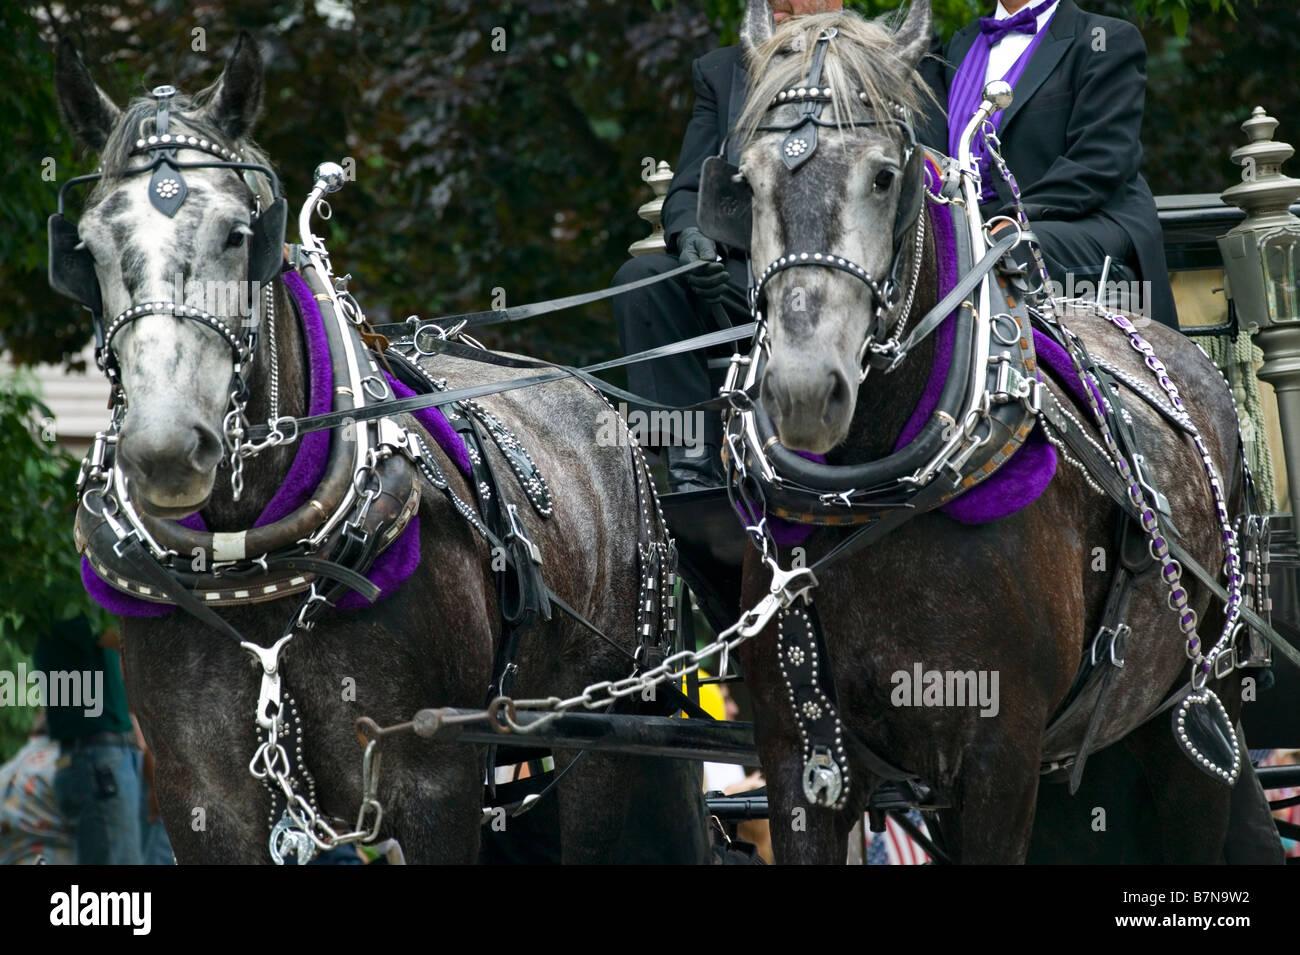 Draft horses in full ornamental harness. - Stock Image